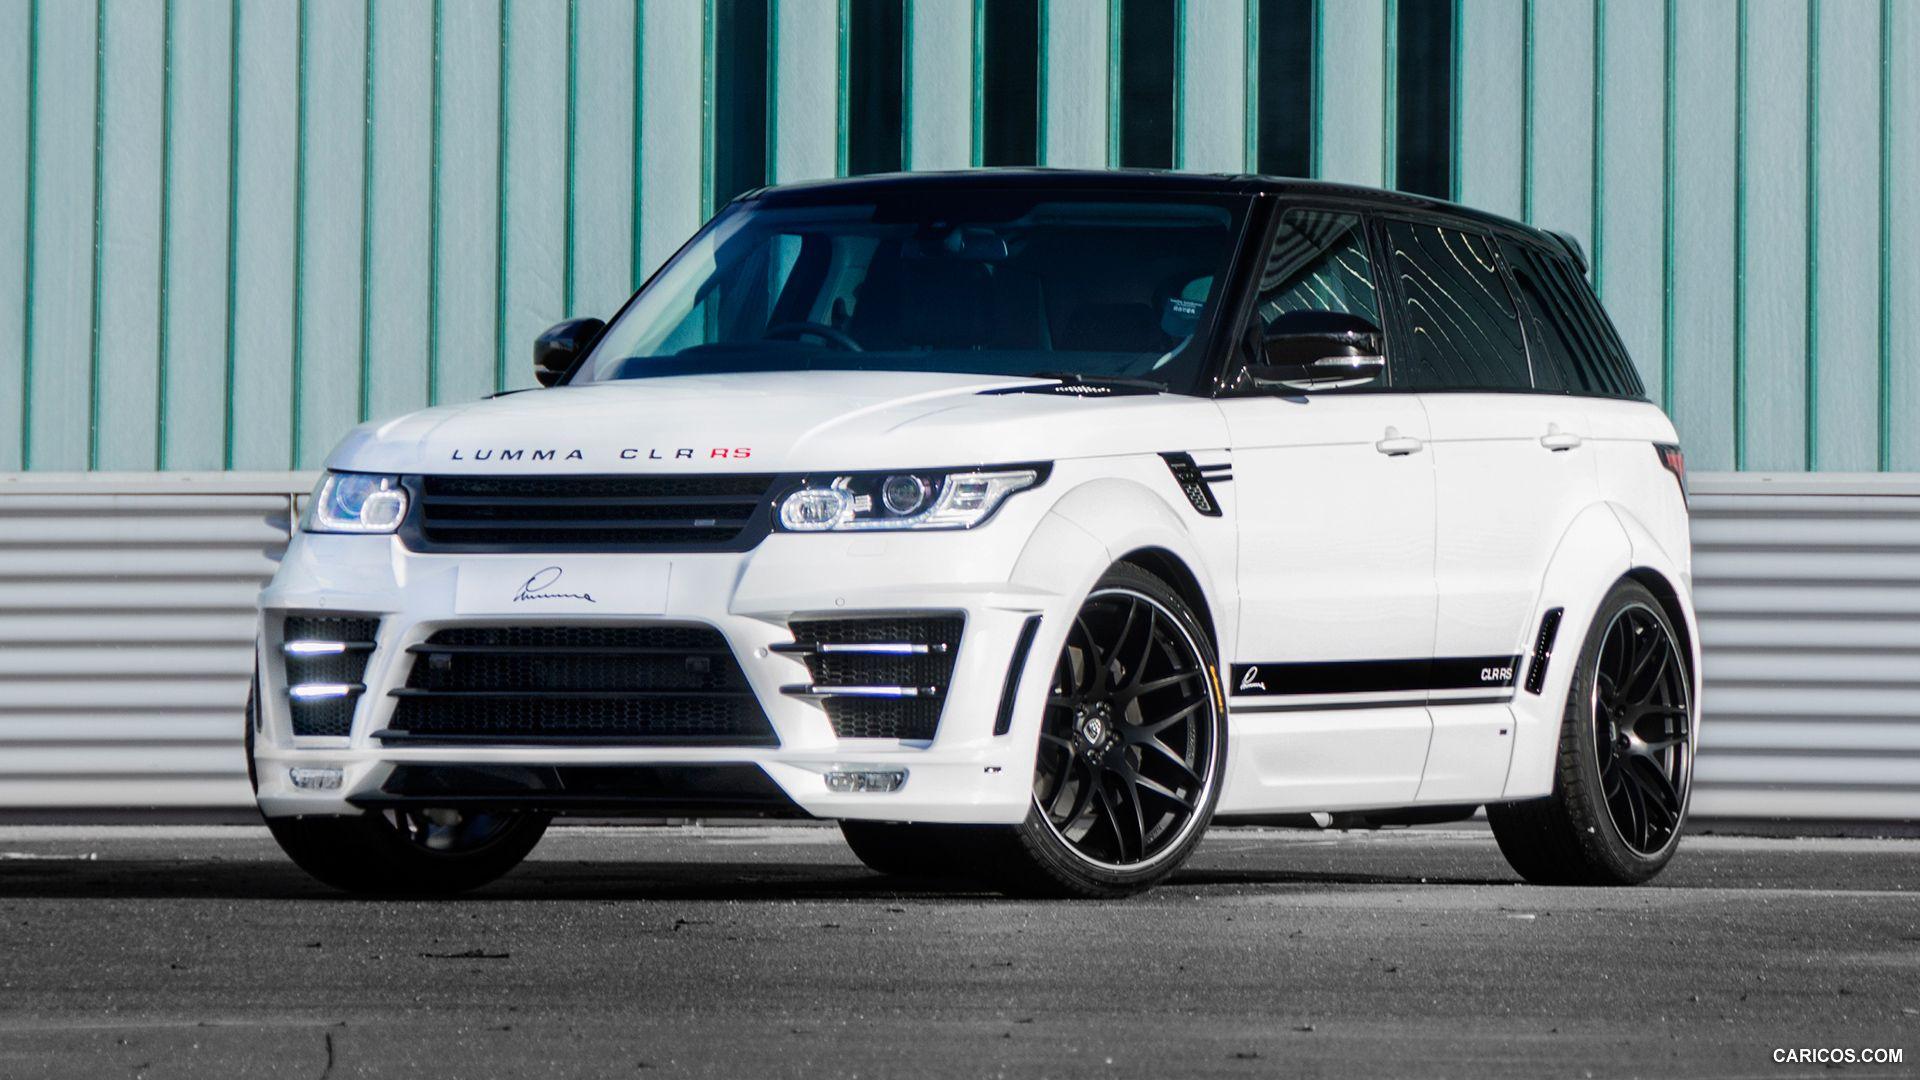 CARICOS LUMMA Design Range Rover Sport CLR RS 2014 Link a la